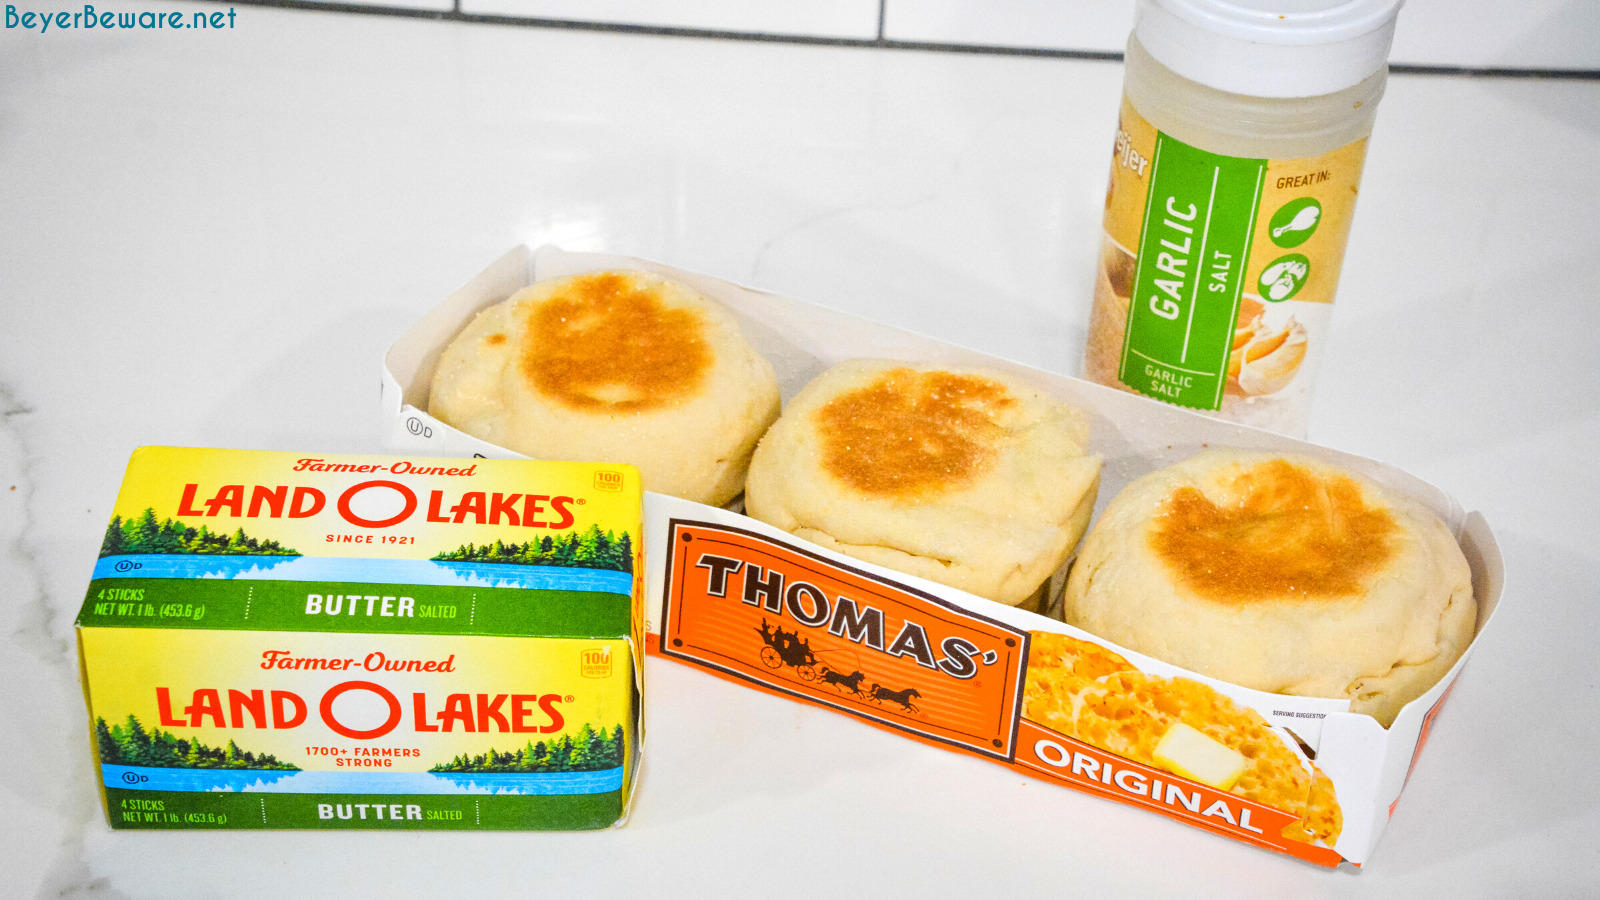 English Muffin Garlic Toast Ingredients - English Muffins, Butter, Garlic Salt